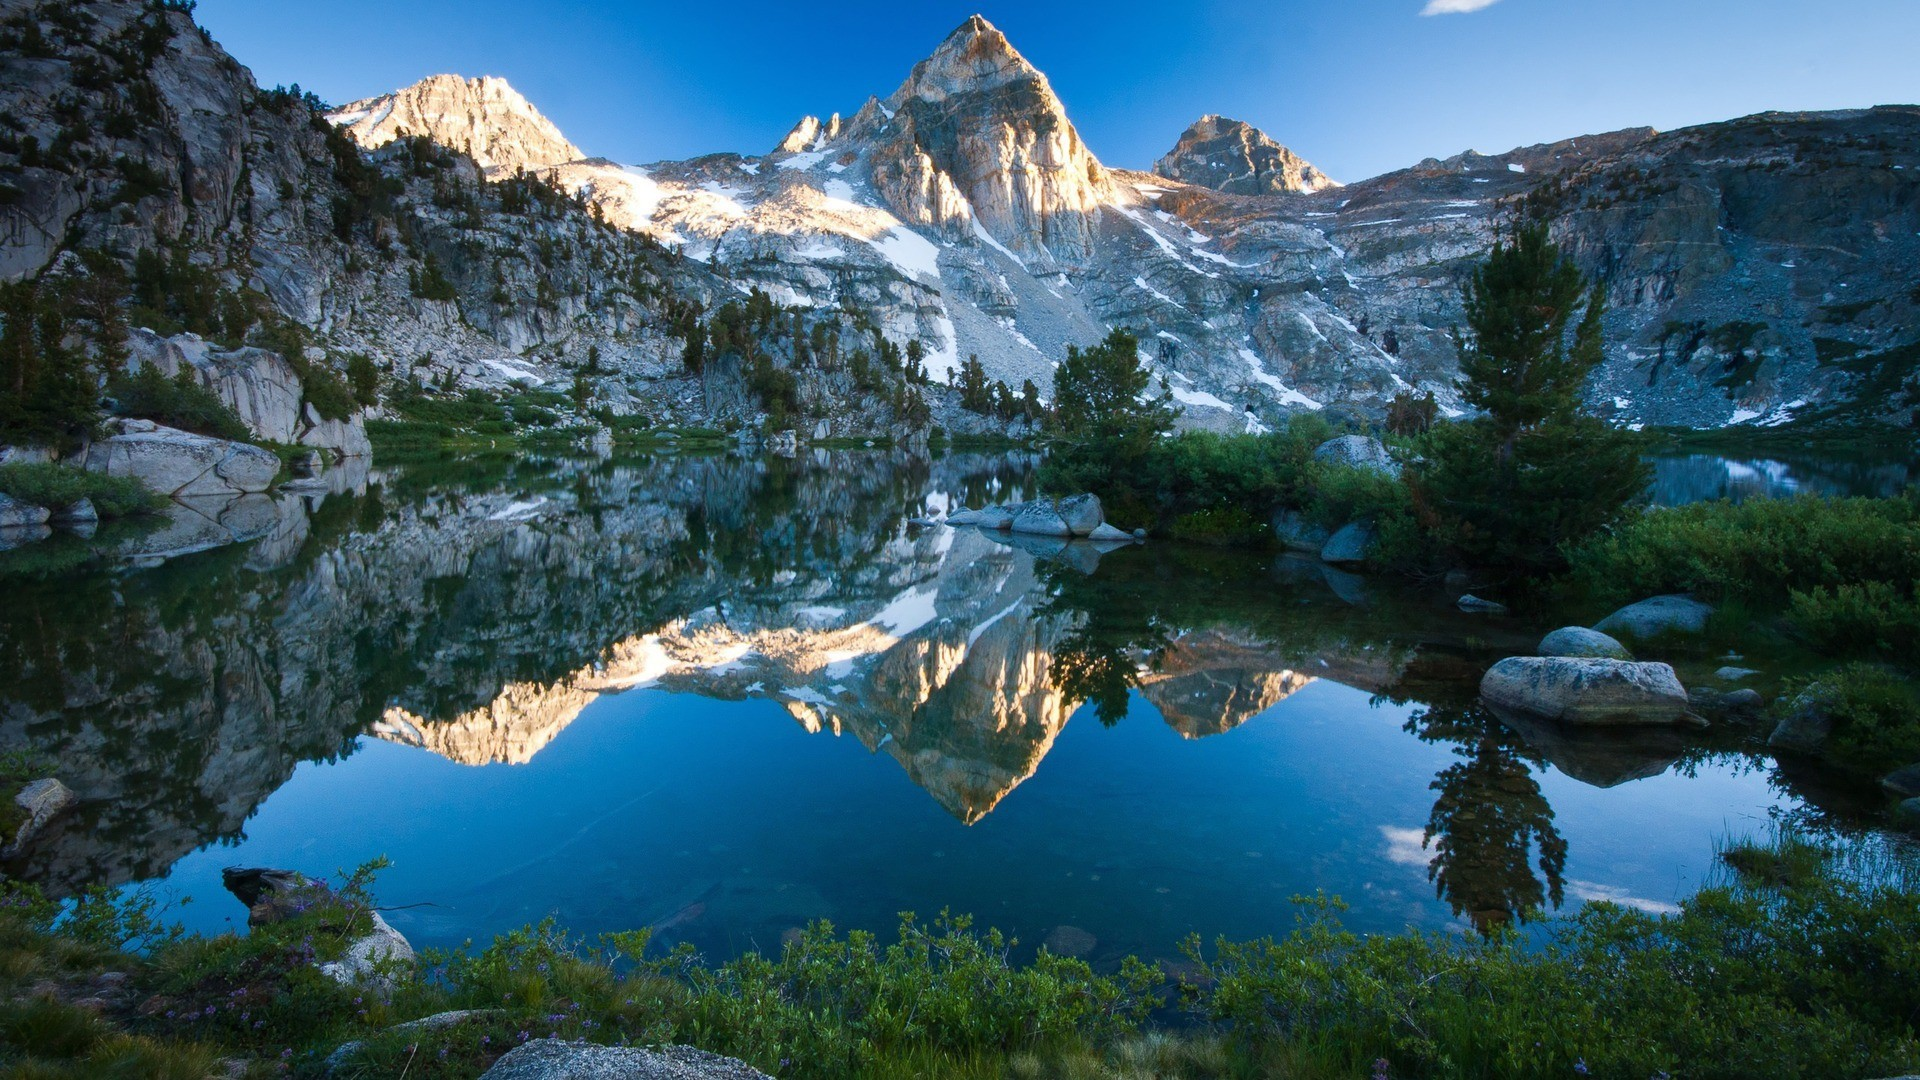 Nature Scenes Wallpapers | Sky HD Wallpaper